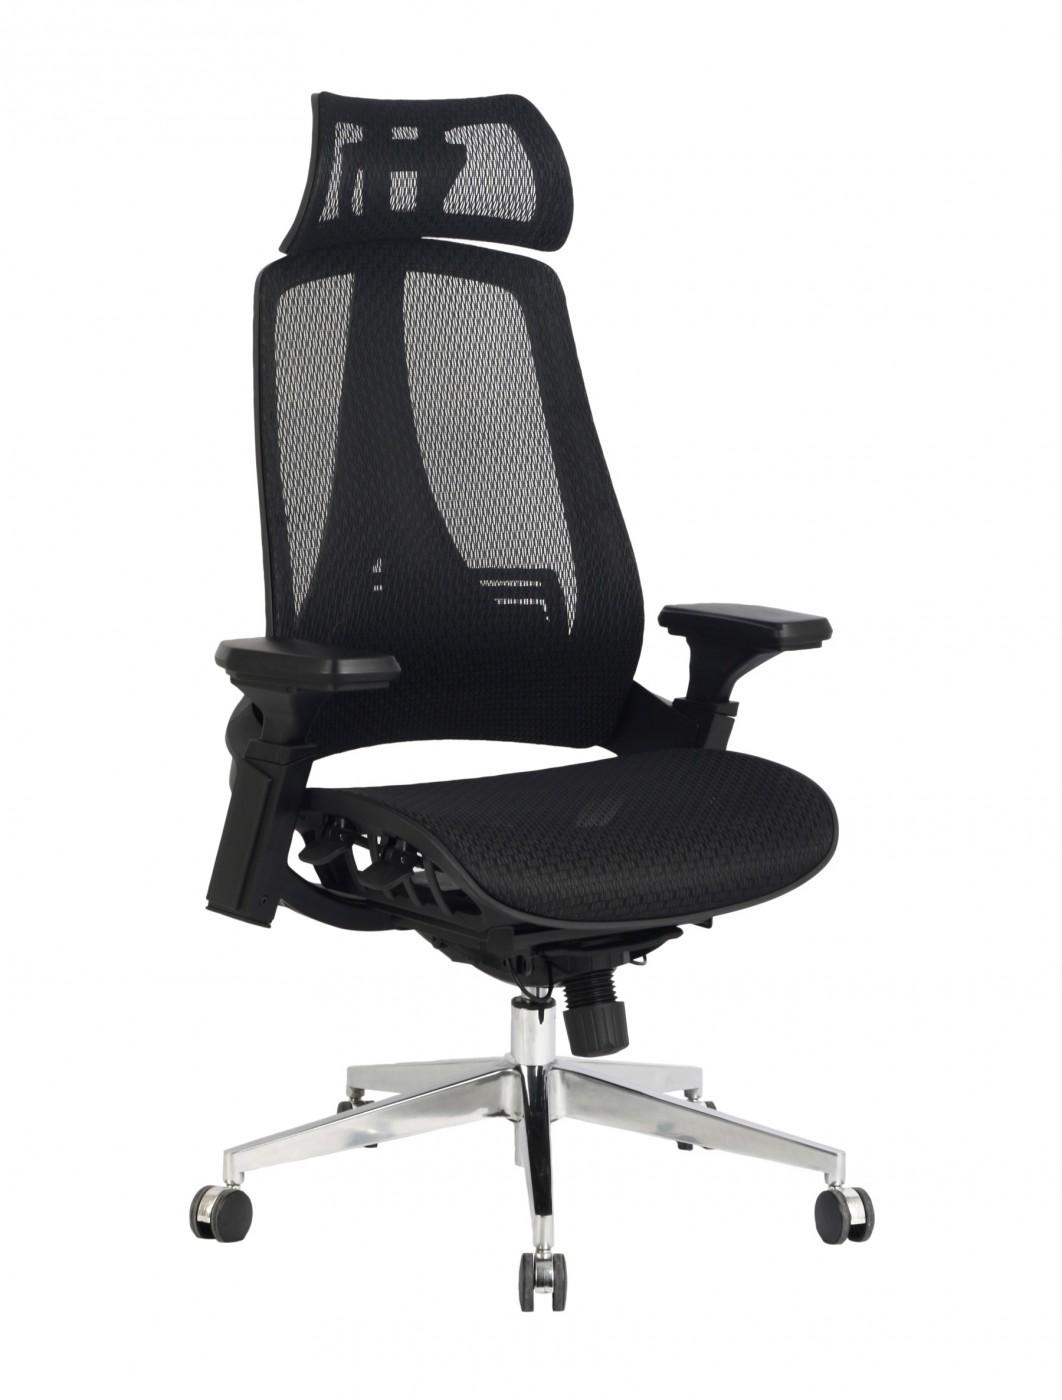 Back posture chair - Dams Sorrento Mesh Back Posture Chair Sor300k2 K 121 Office Furniture